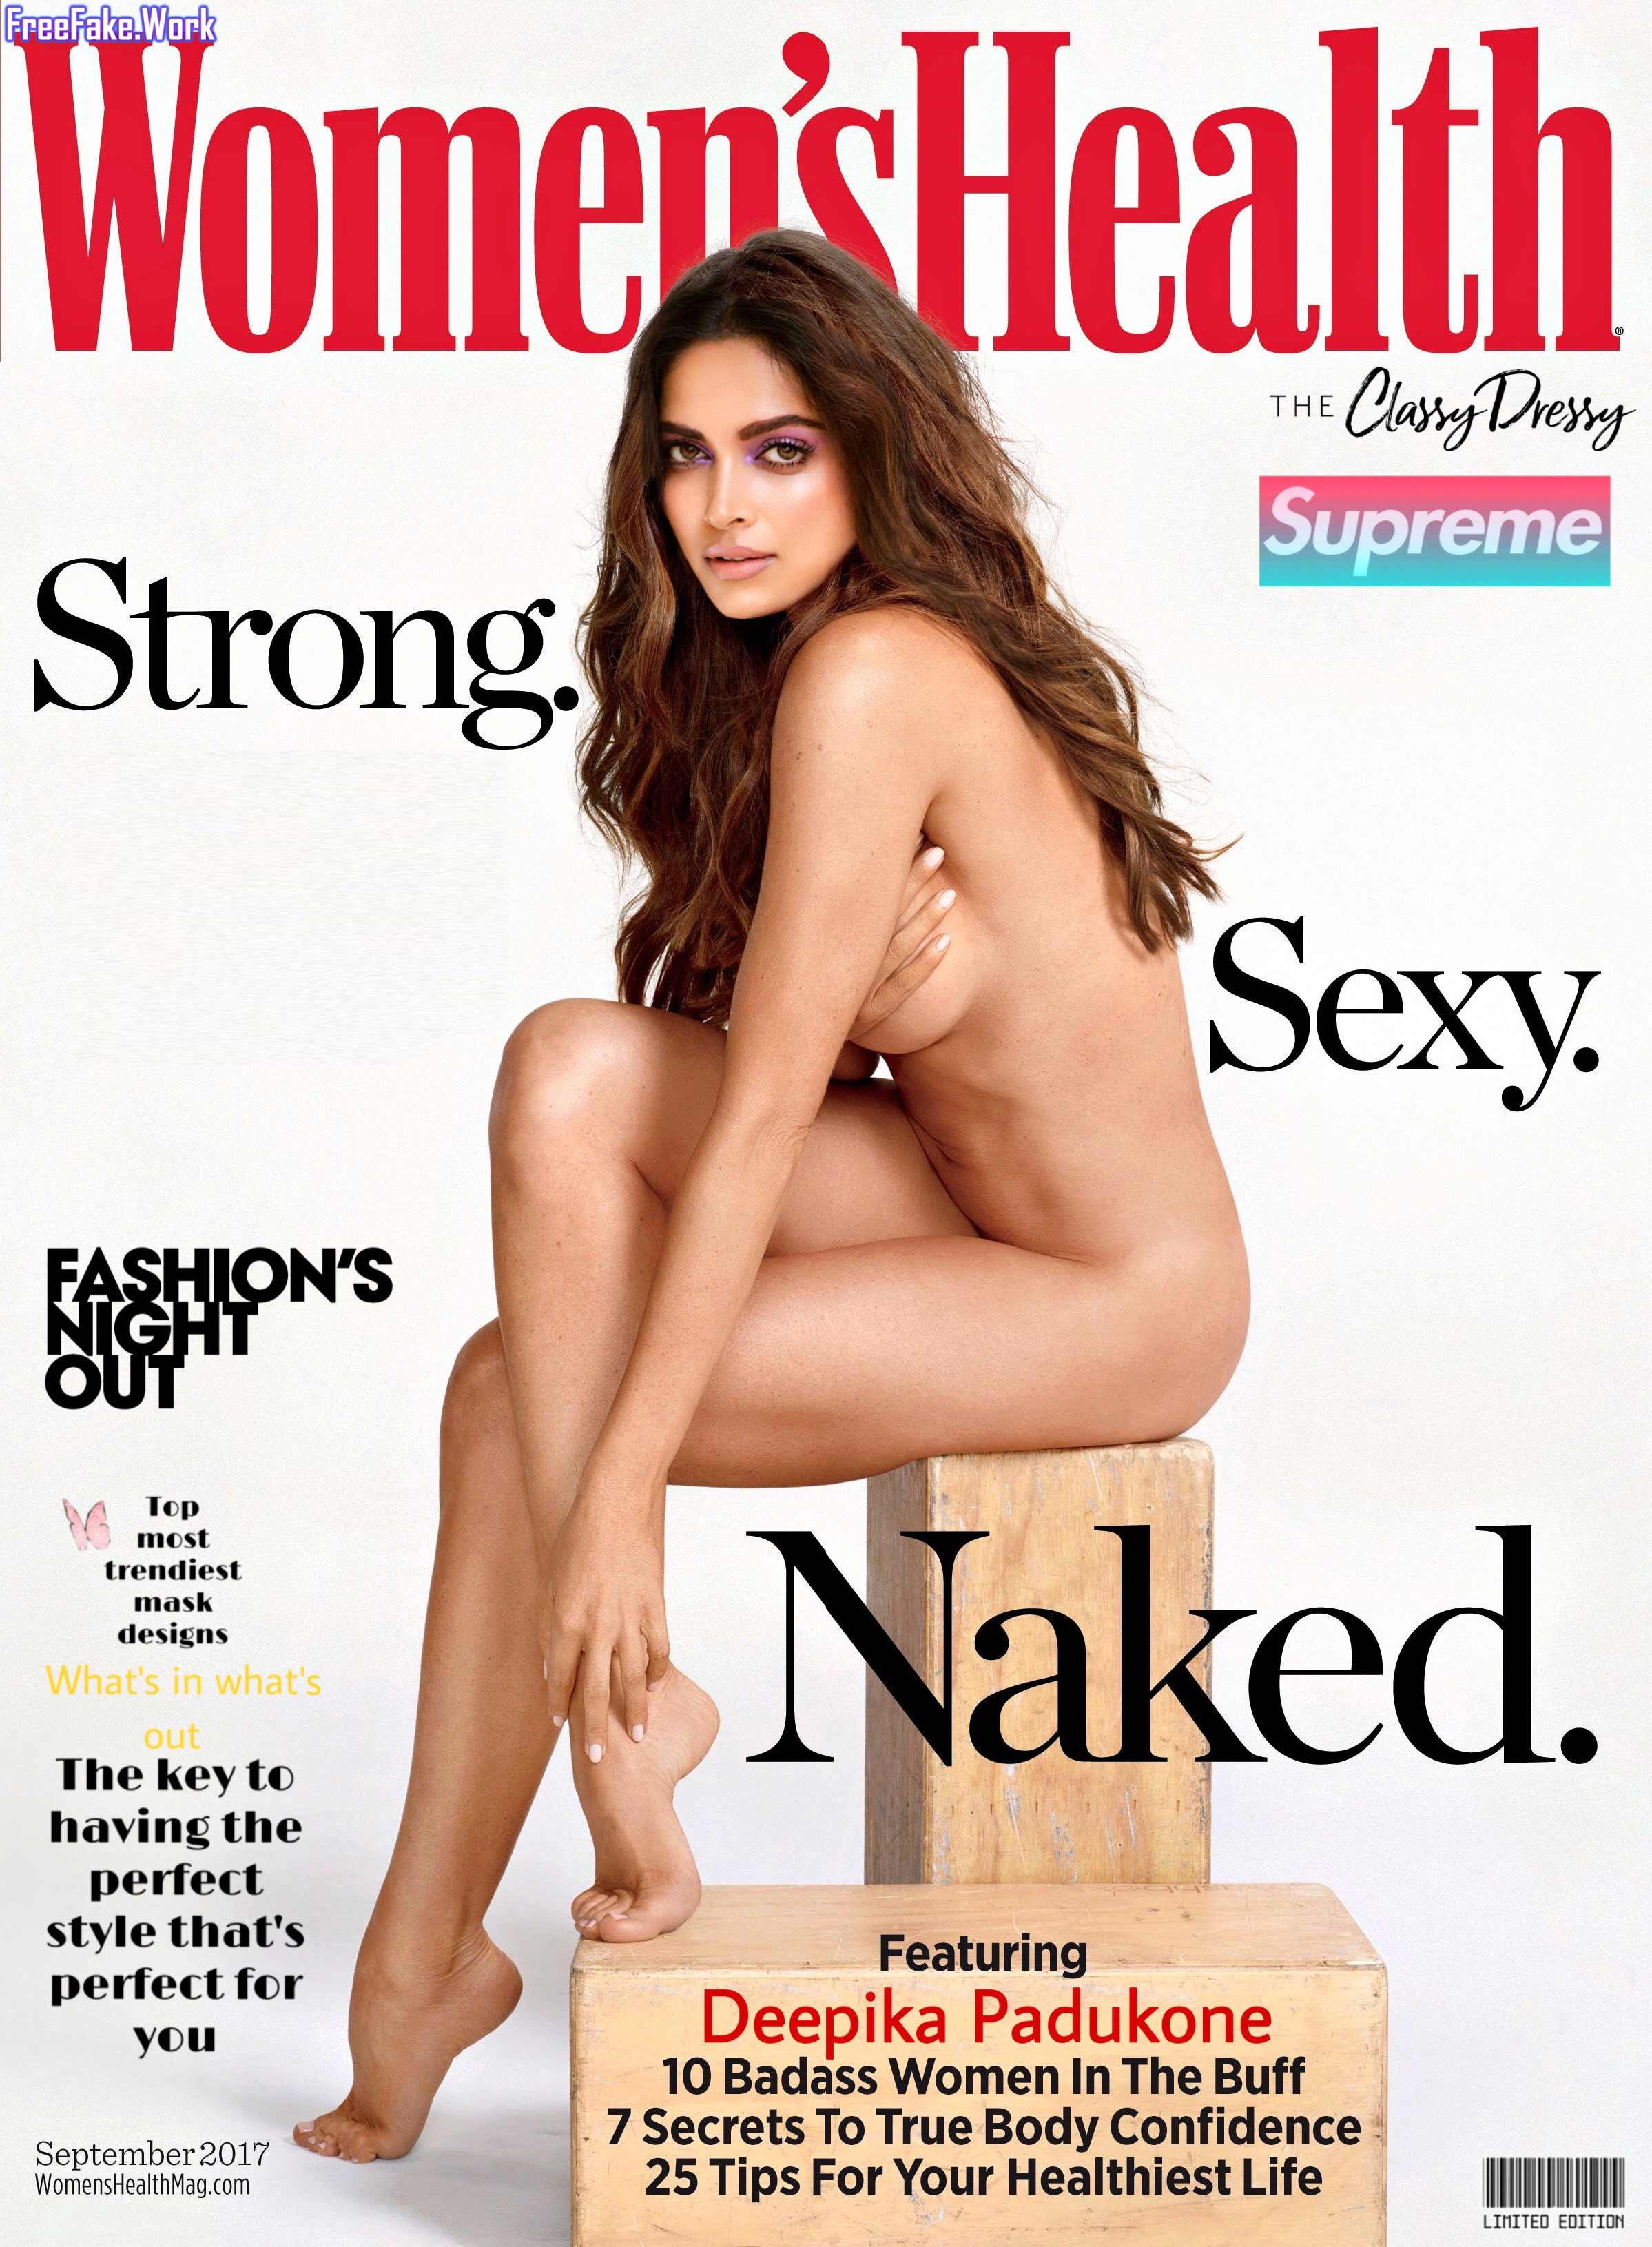 Deepika-padukone-naked-magazine-cover-photo-without-dress.jpg